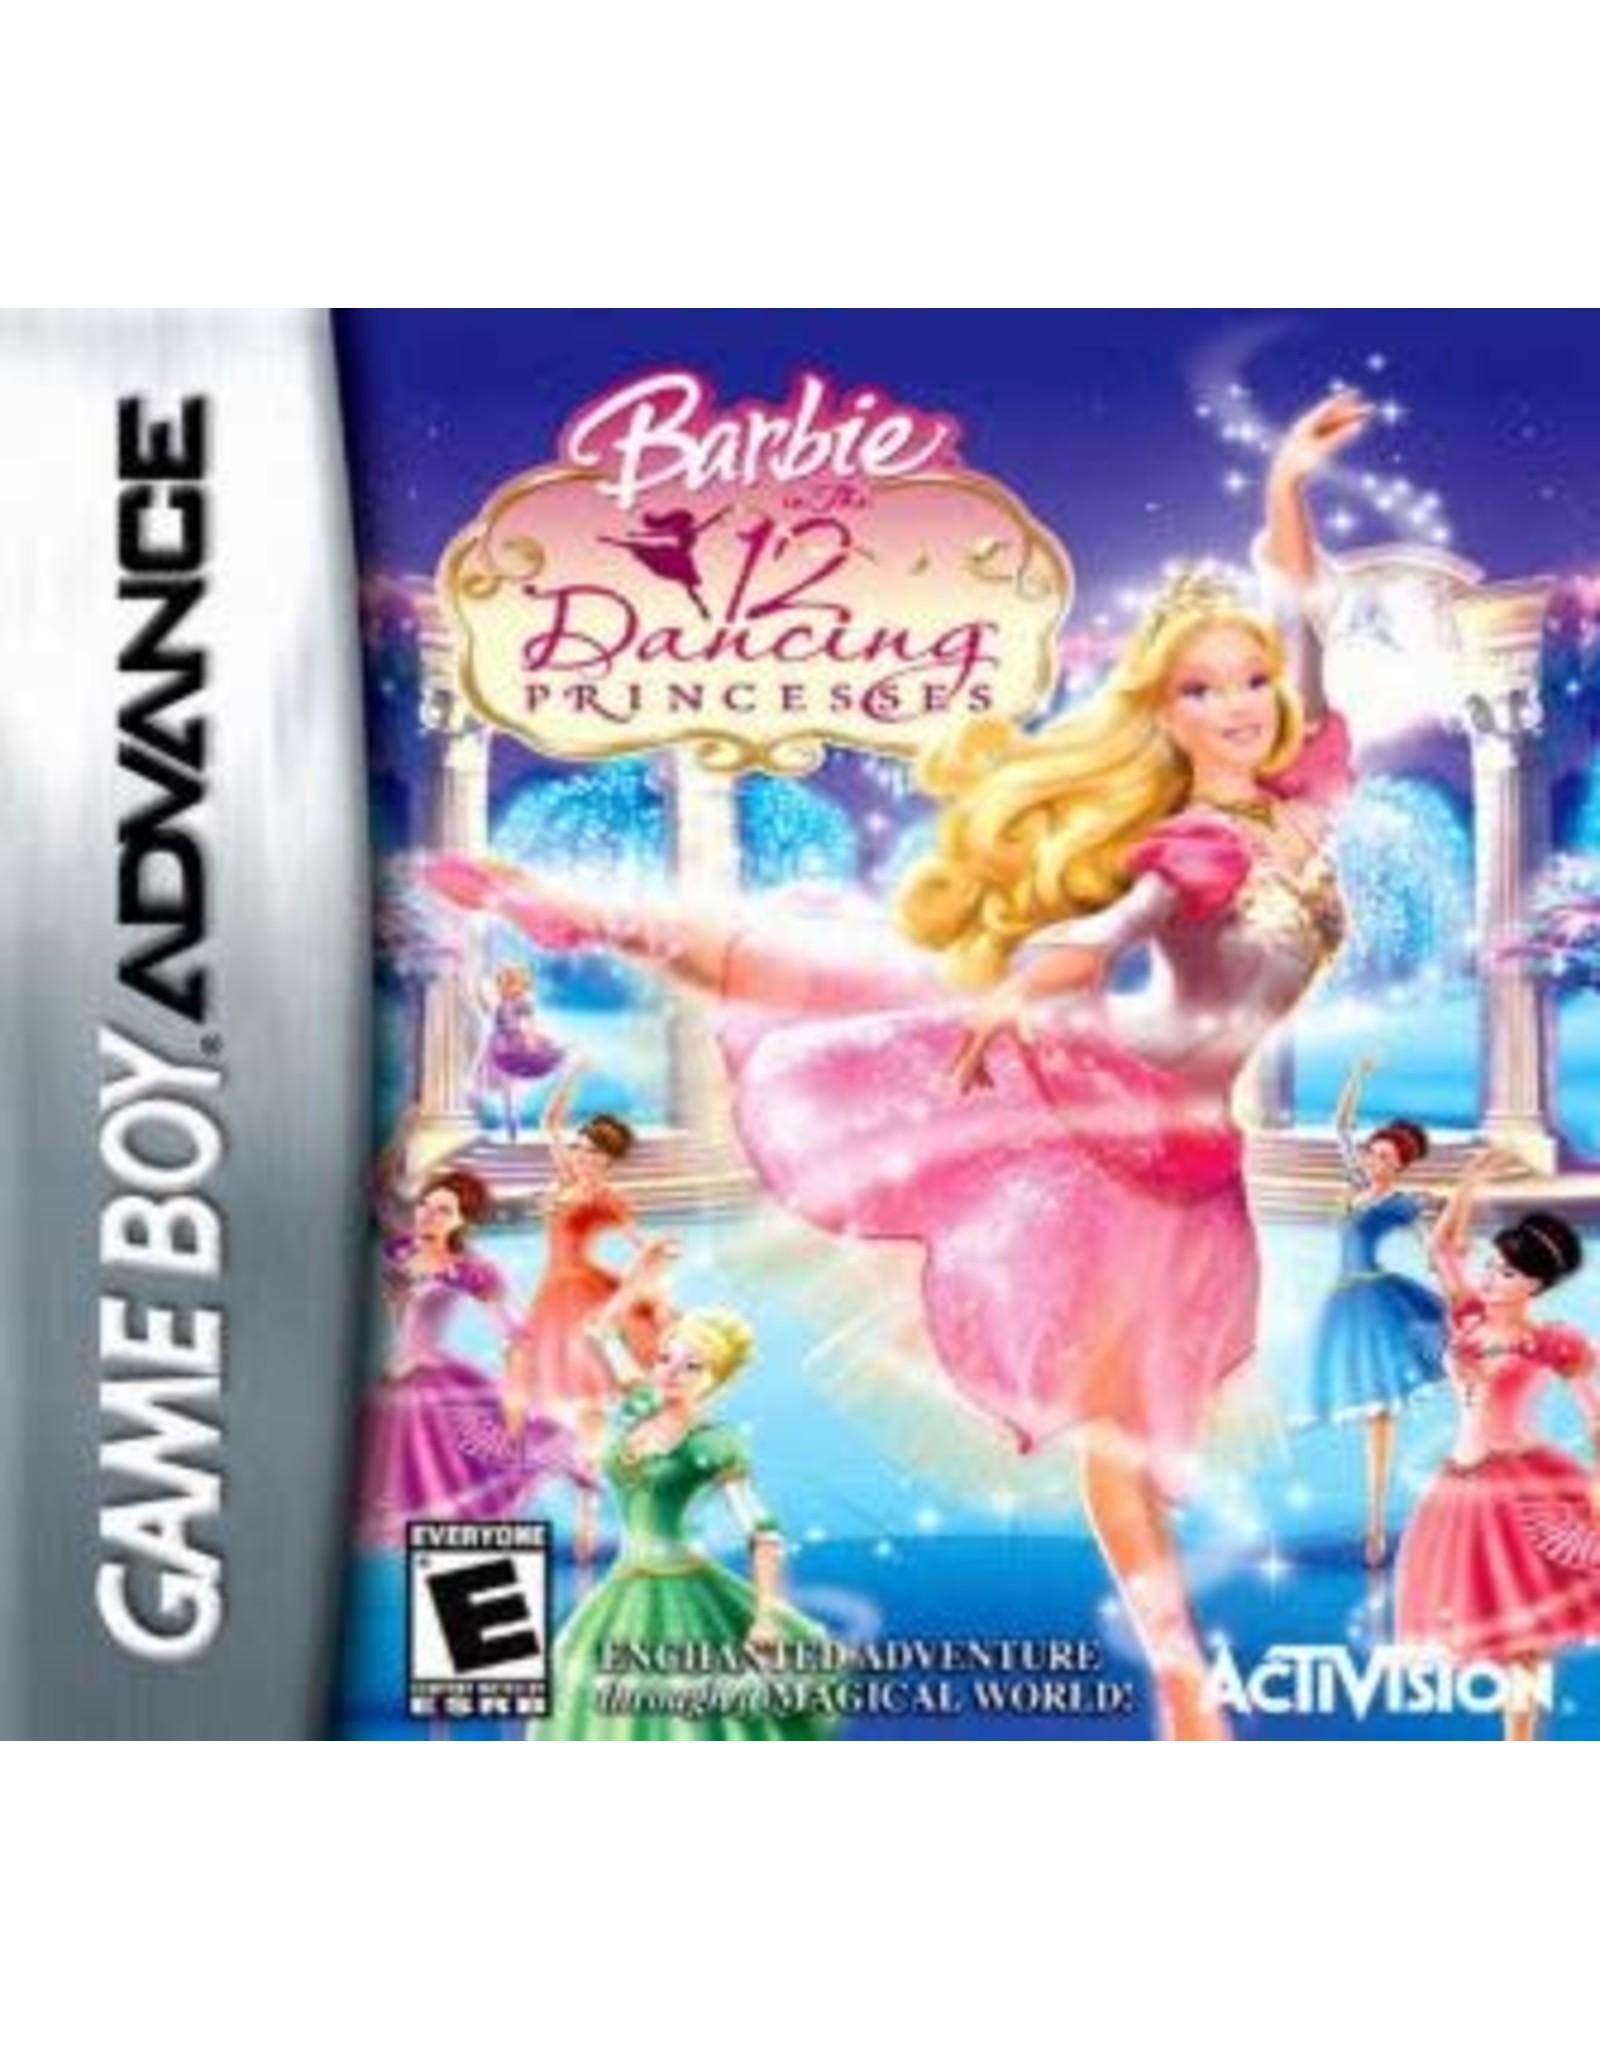 GameBoy Advance Barbie 12 Dancing Princesses (Cart Only)